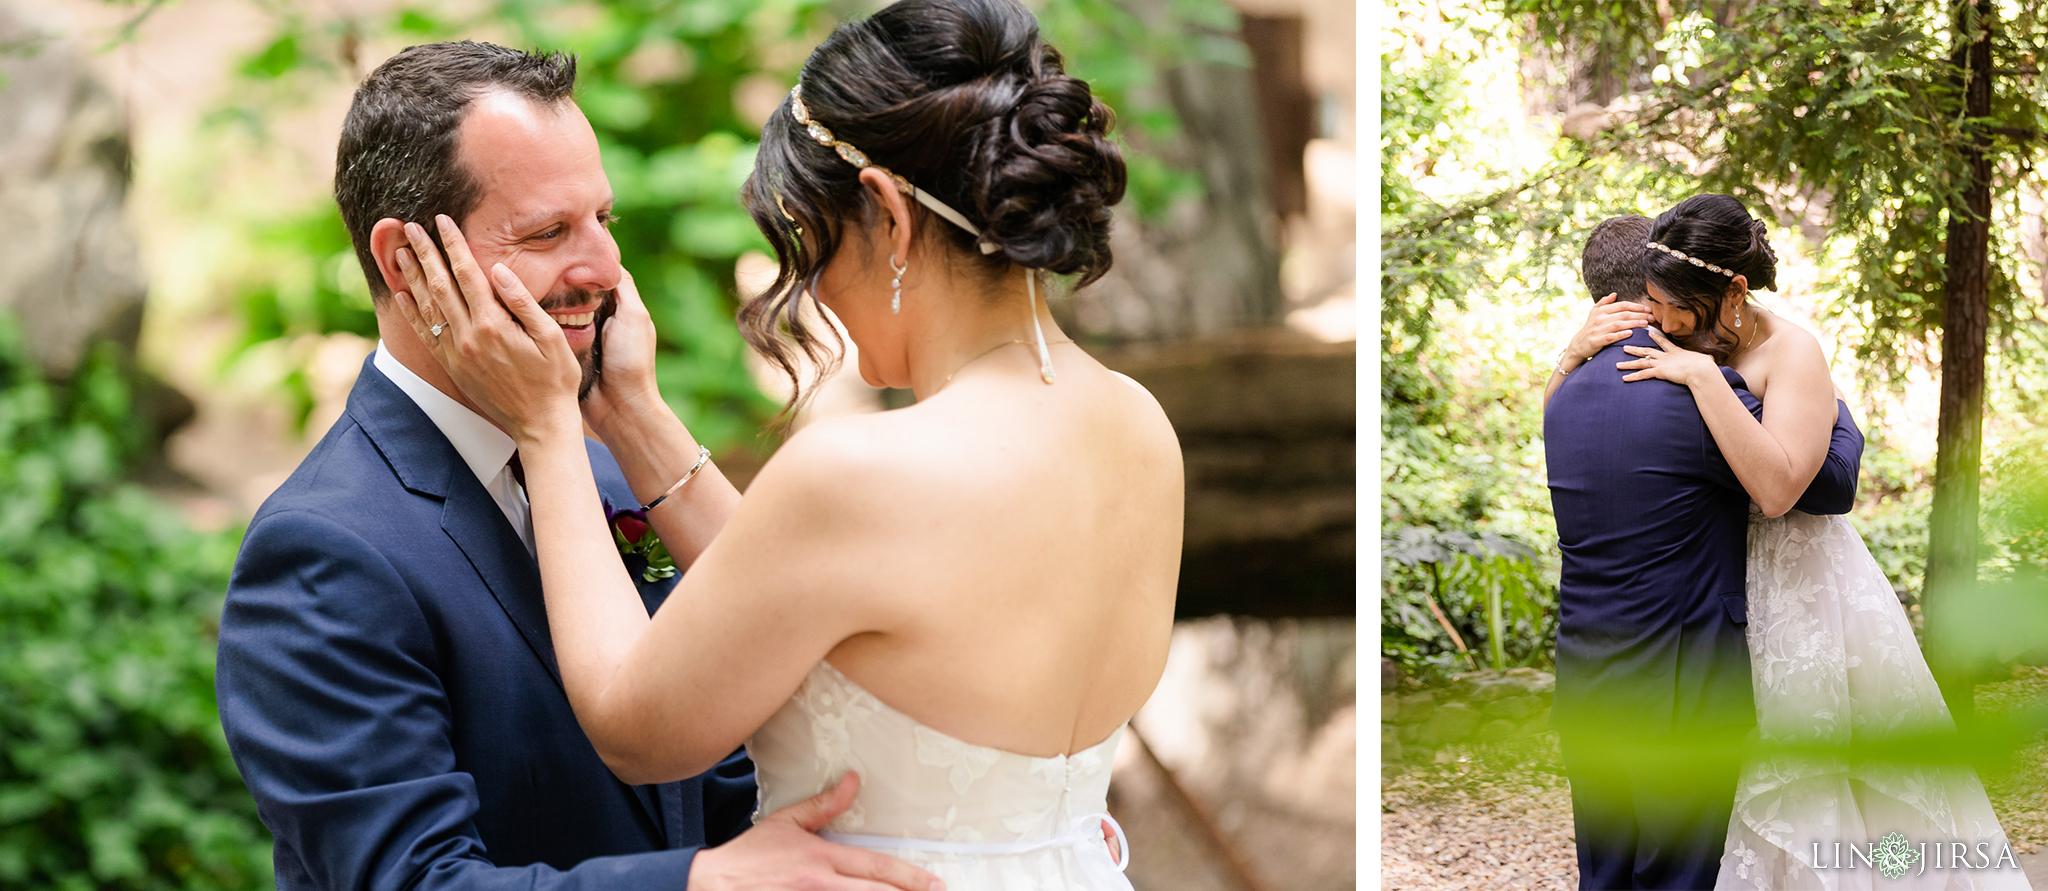 11 Calamigos Rancho Malibu Wedding Photography